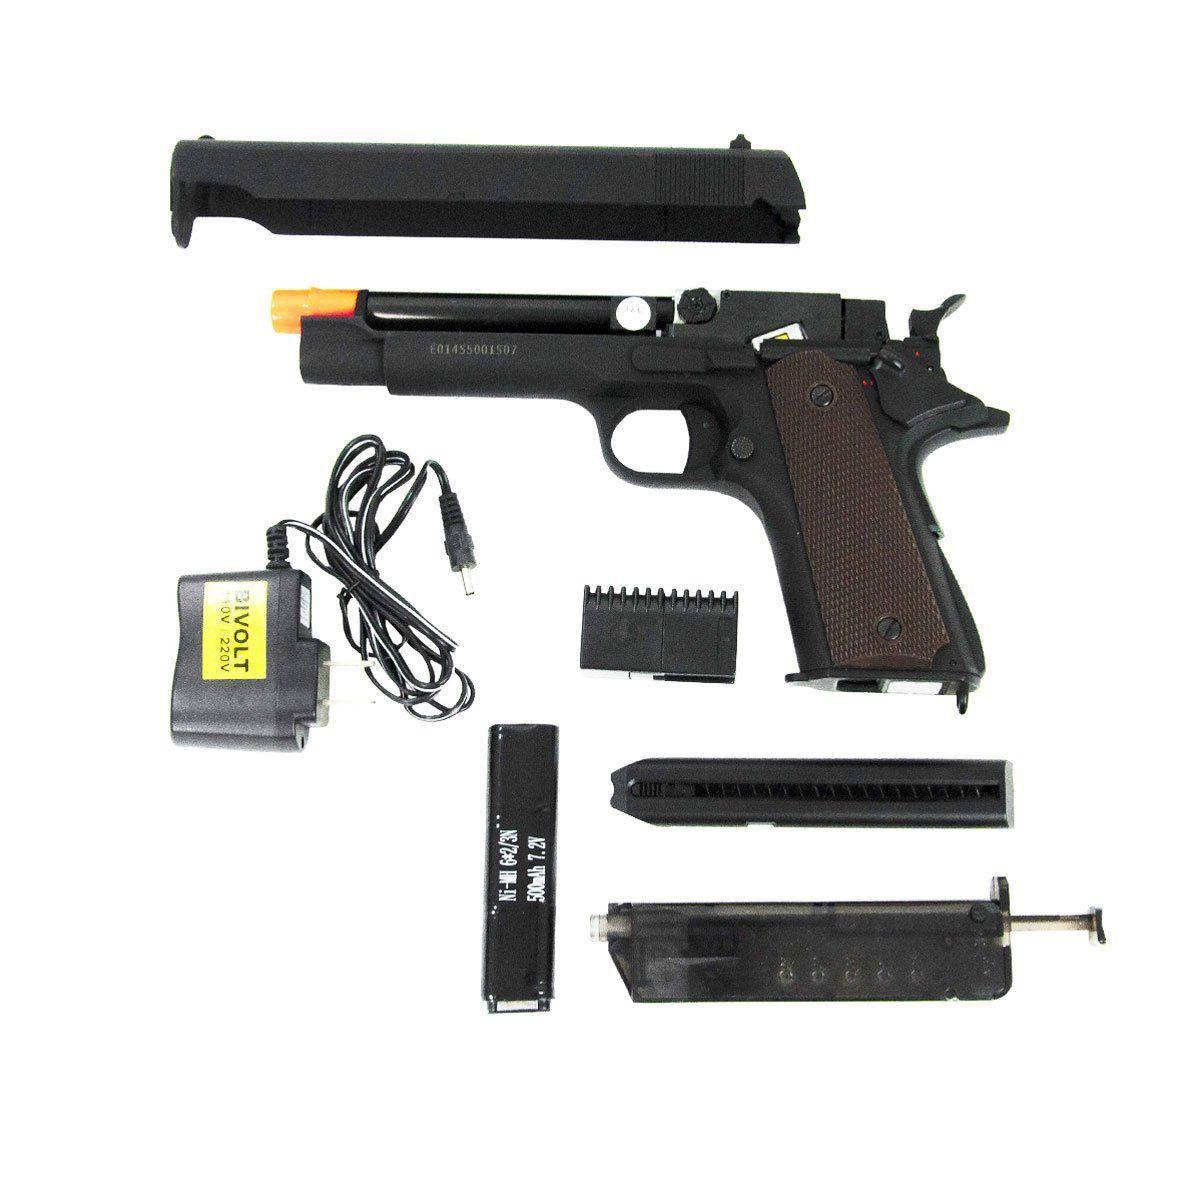 Pistola Airsoft CYMA Colt M1911 CM.123 Slide Metal Elétrica Bivolt